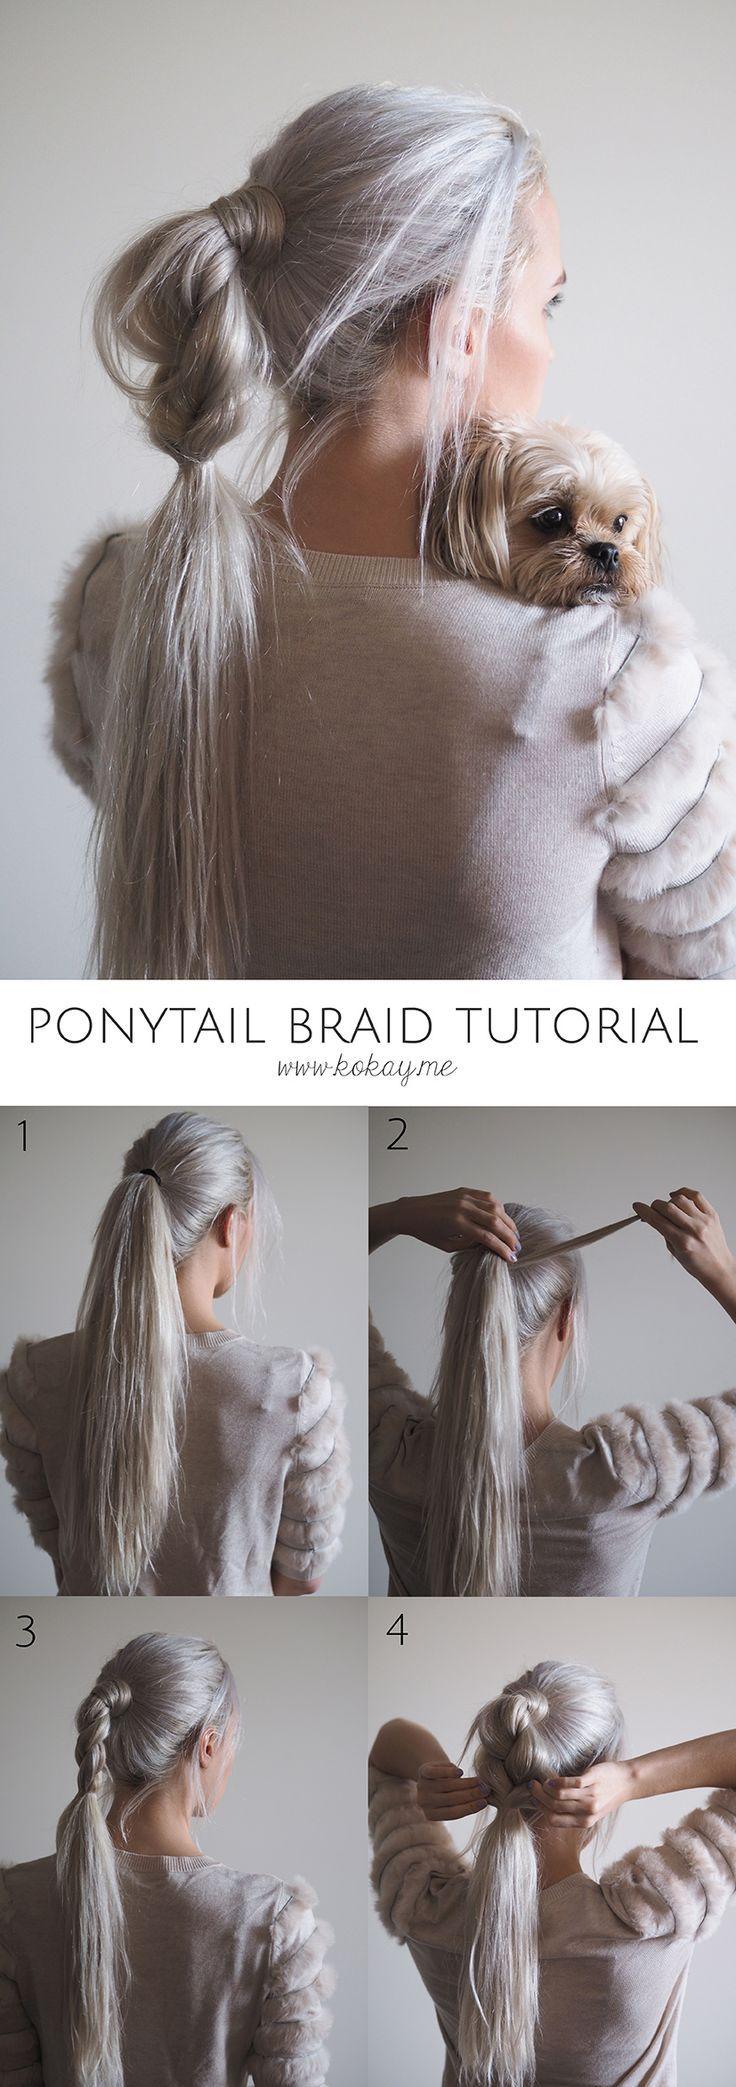 best hairubeauty images on pinterest hair ideas cute